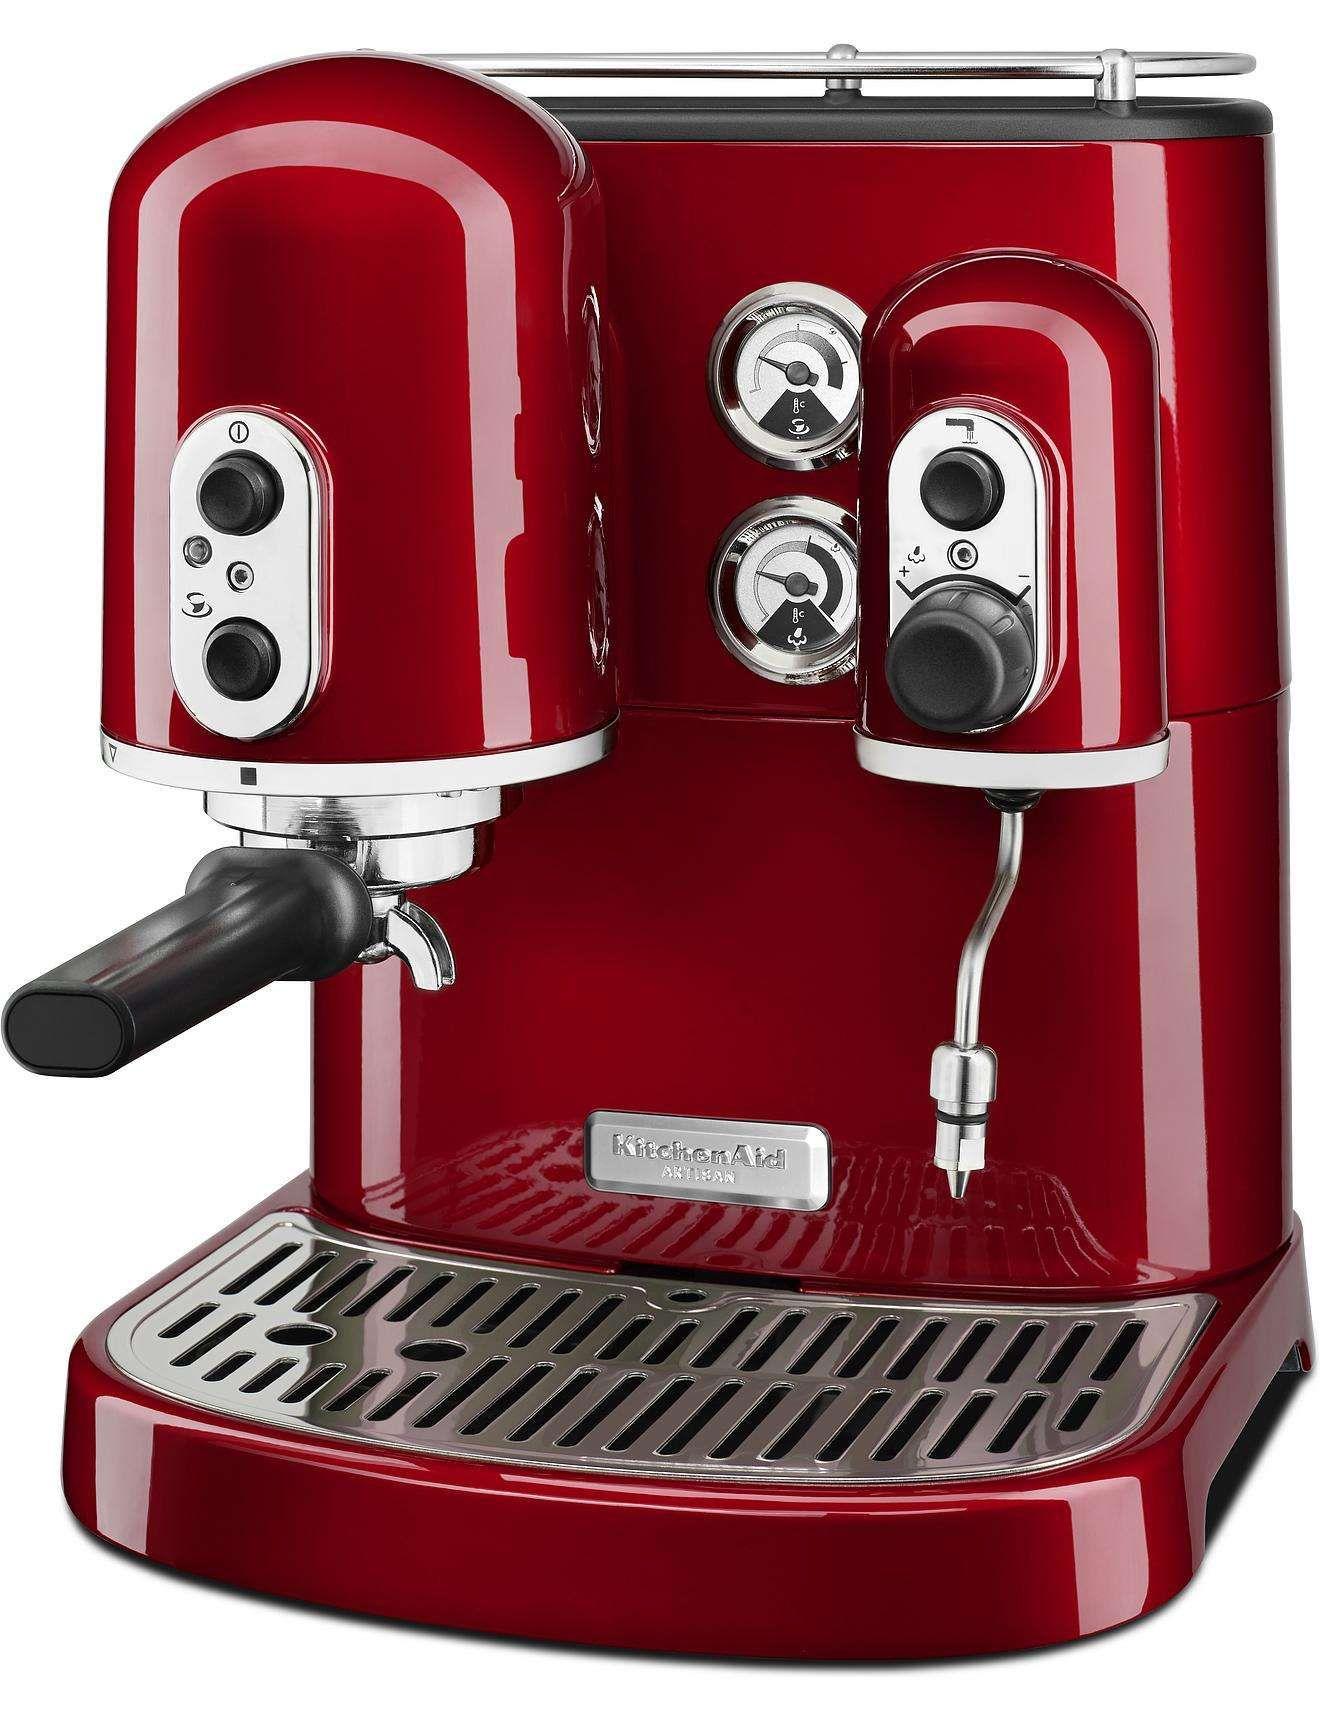 Kes2102 espresso machine candy apple red david jones